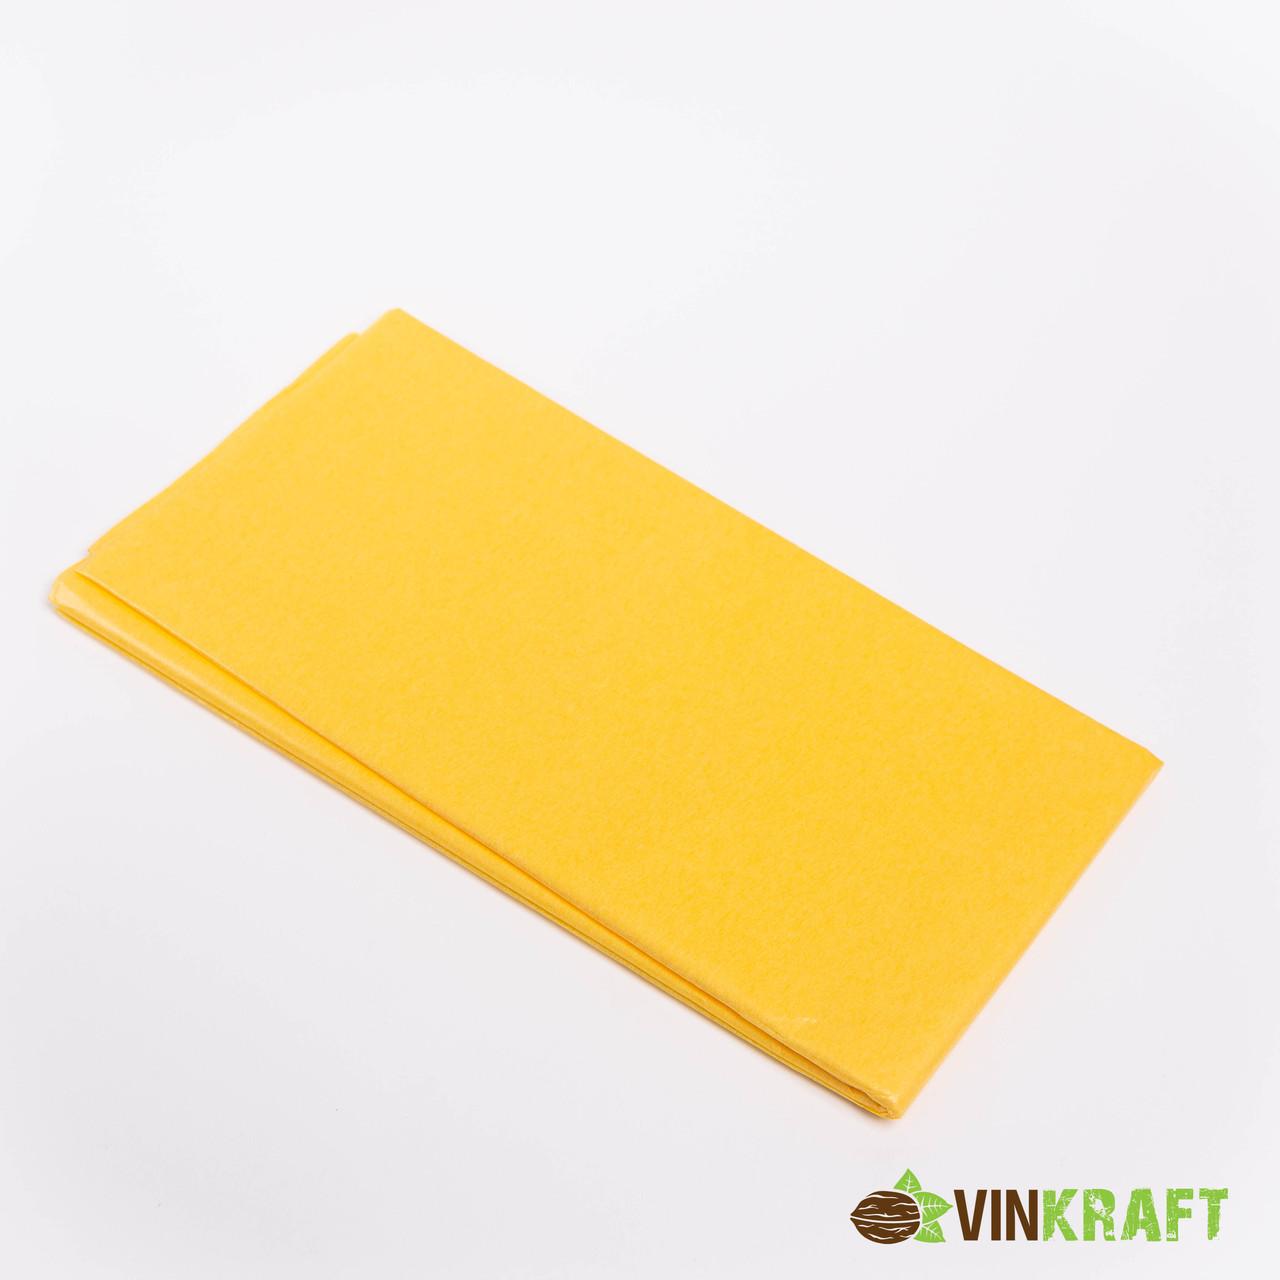 Папір тишью 50*70 см (10 аркушів), жовтий